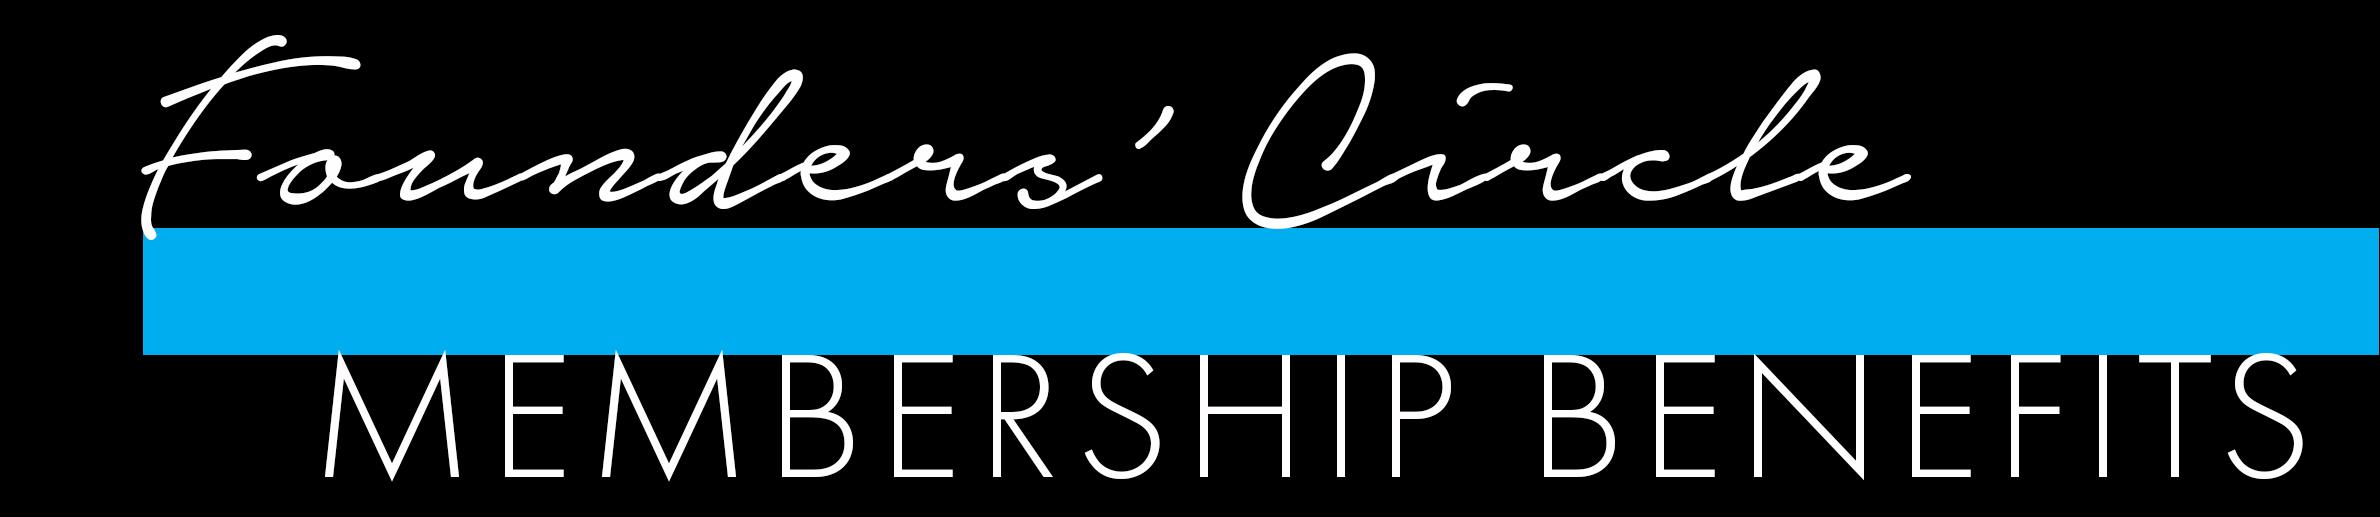 FC- Membership Benefits Header-1.jpg